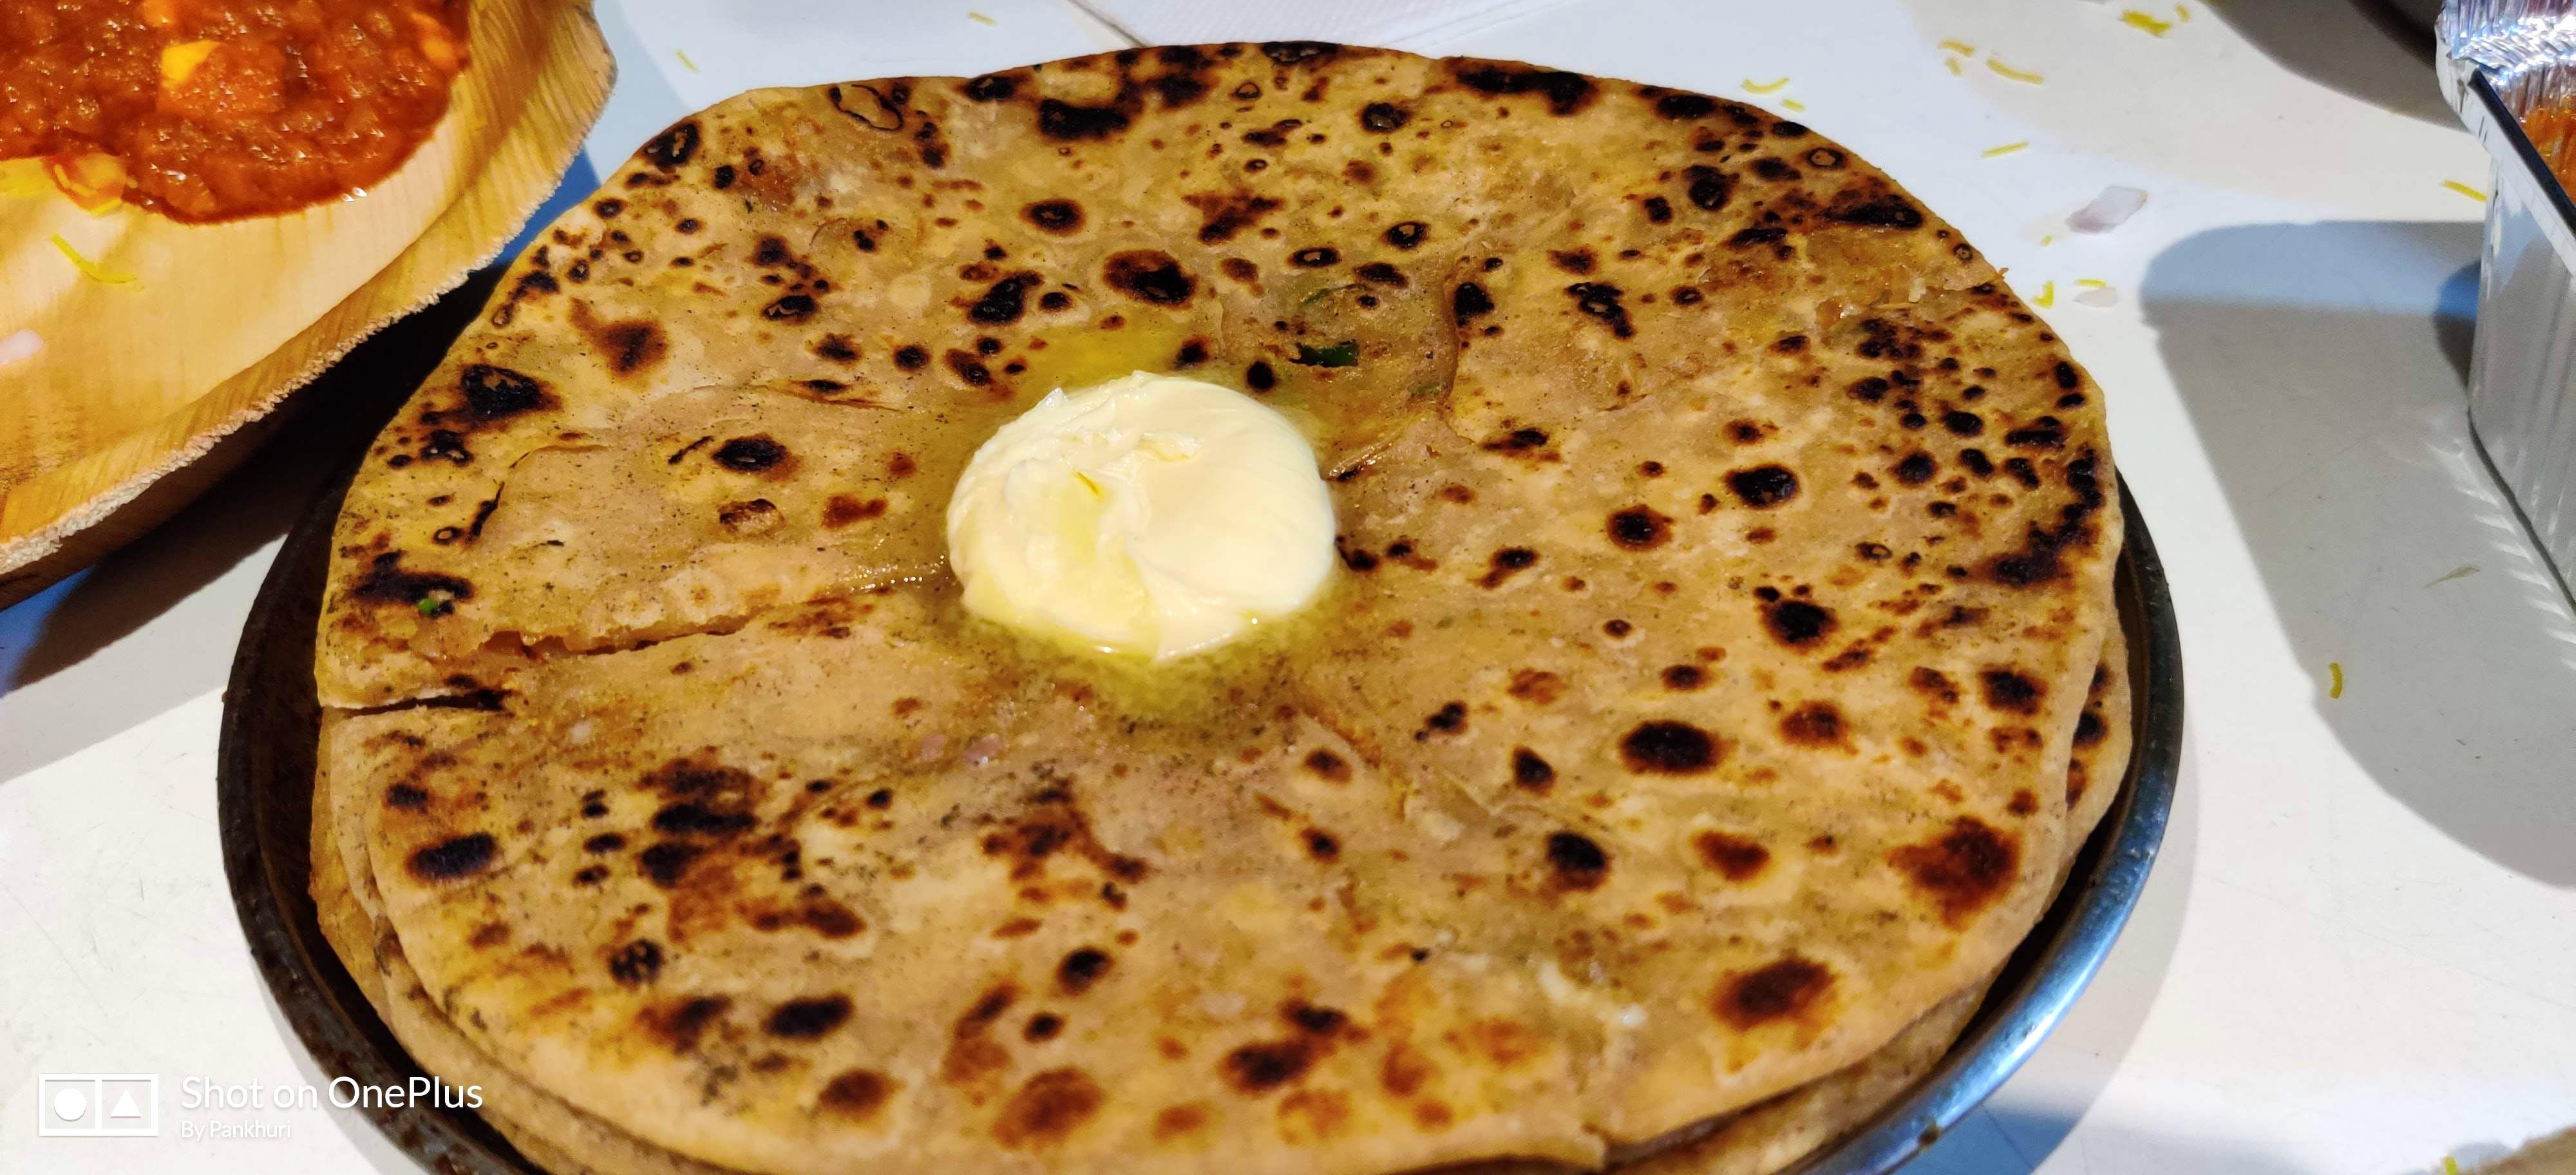 Dish,Food,Cuisine,Ingredient,Roti,Bazlama,Naan,Flatbread,Paratha,Baked goods